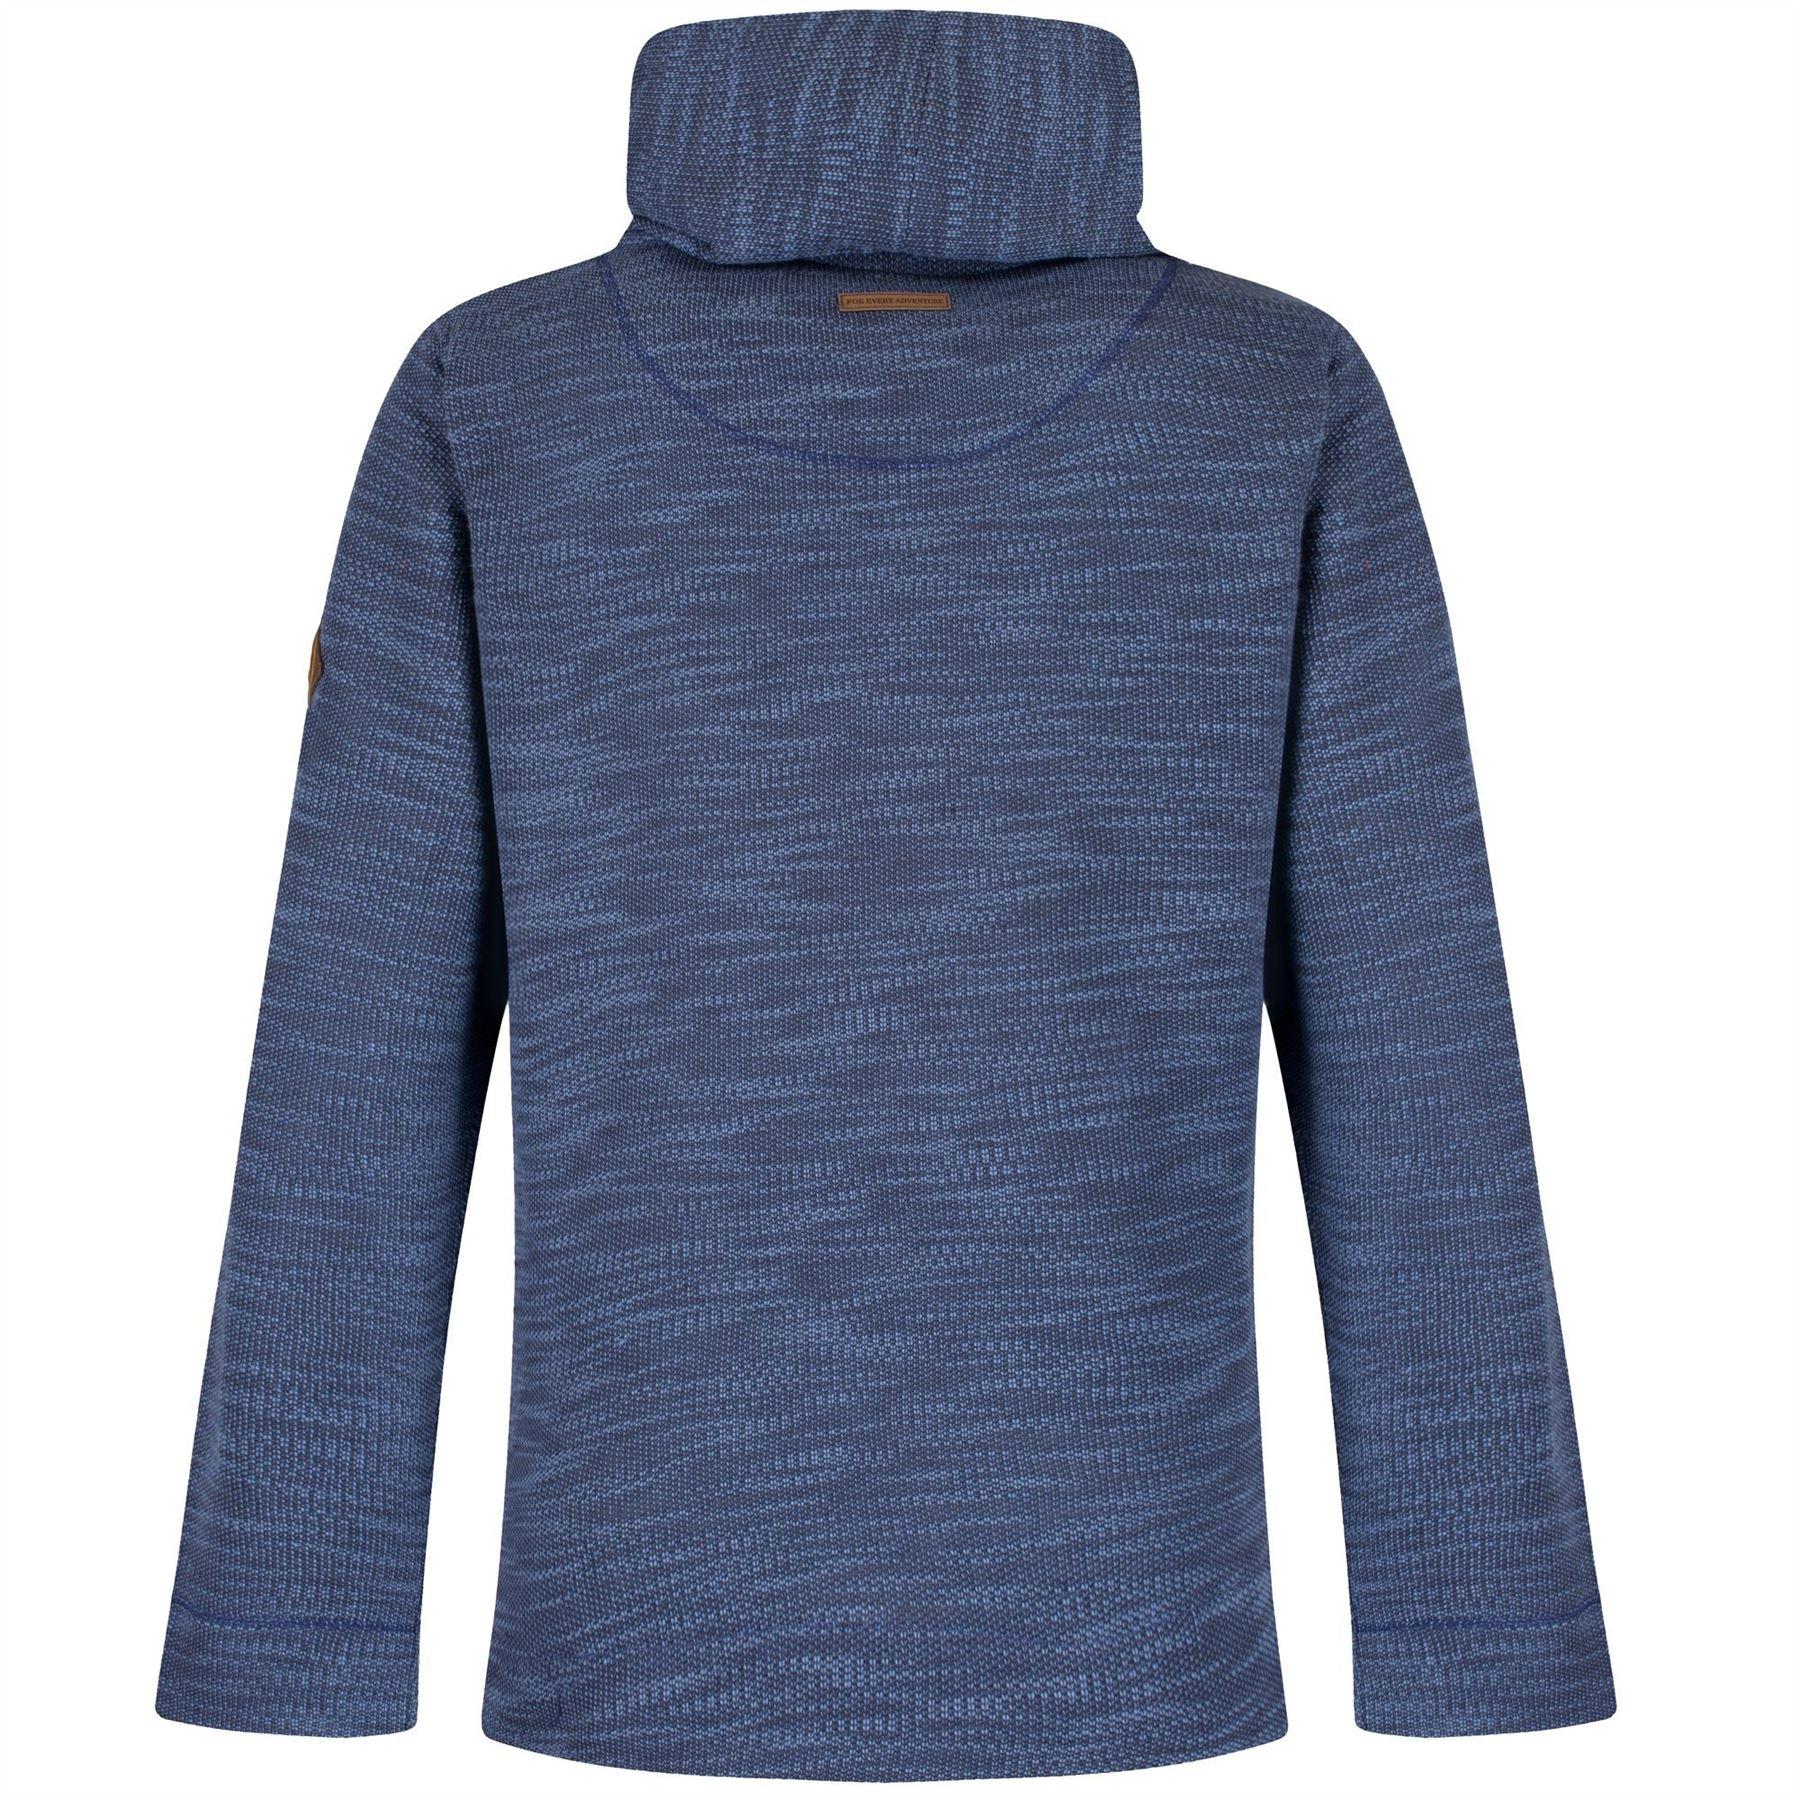 Regatta-Ceanna-Cowl-Neck-Soft-Fleece-Pull-Over-Jumper-Sweater-Top-RWA276 thumbnail 7